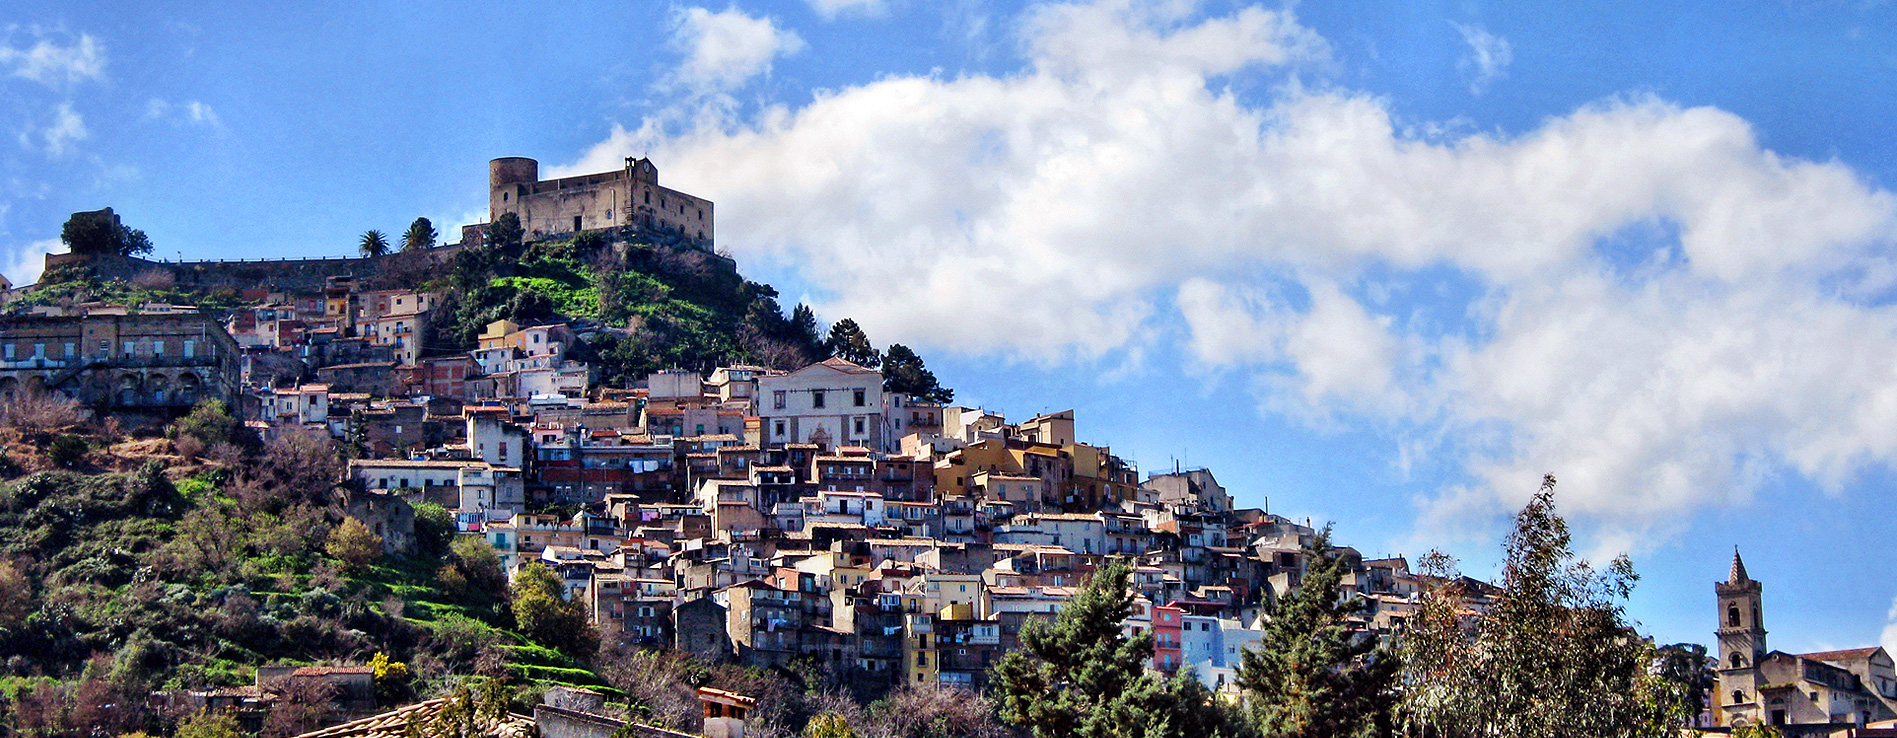 Arcidiocesi di Messina Lipari S. Lucia del Mela